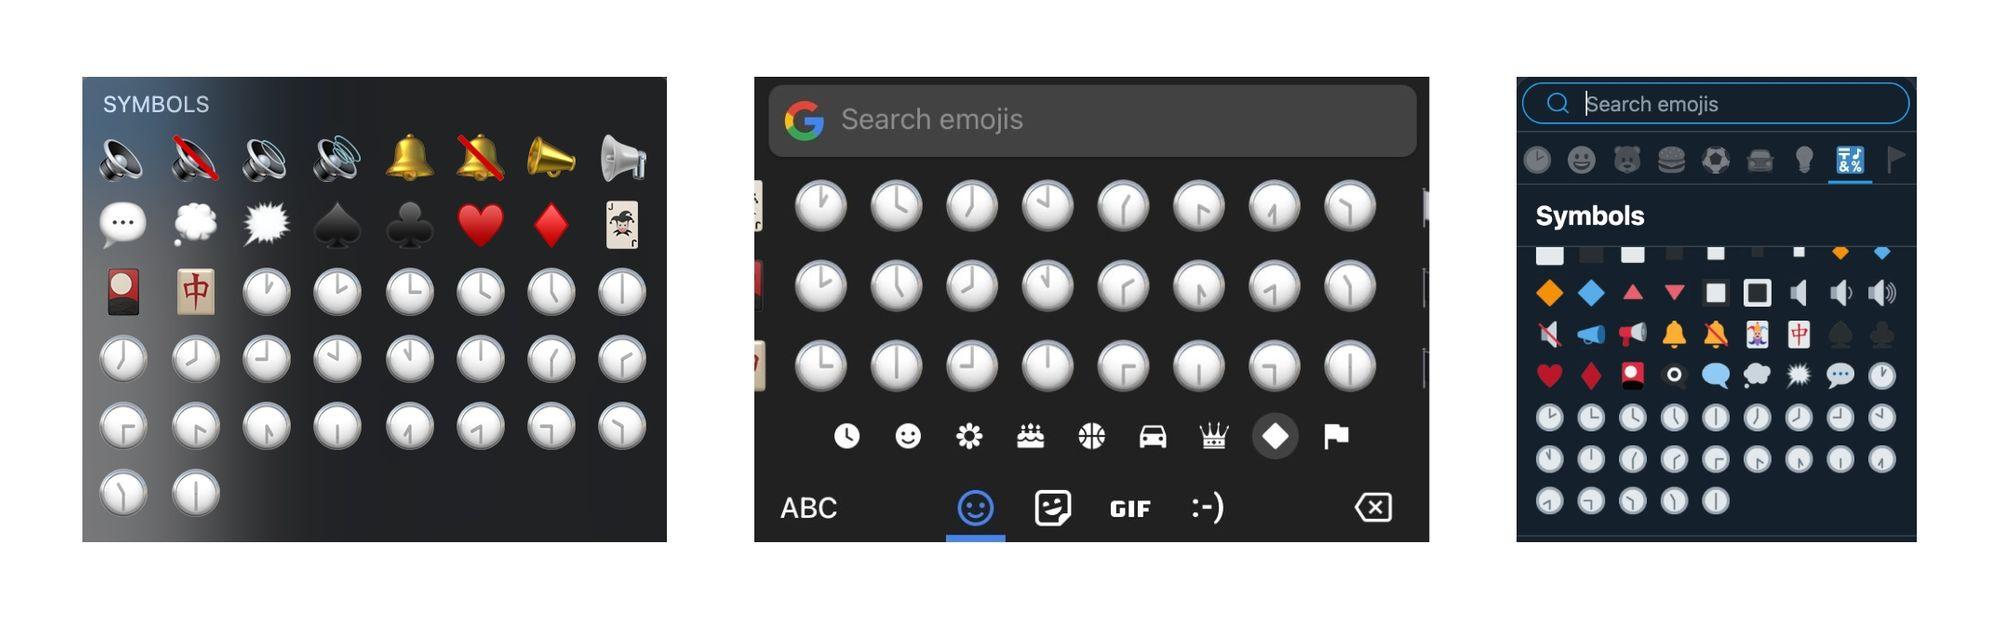 emoji-pickers-apple-google-twitter-2021-emojipedia